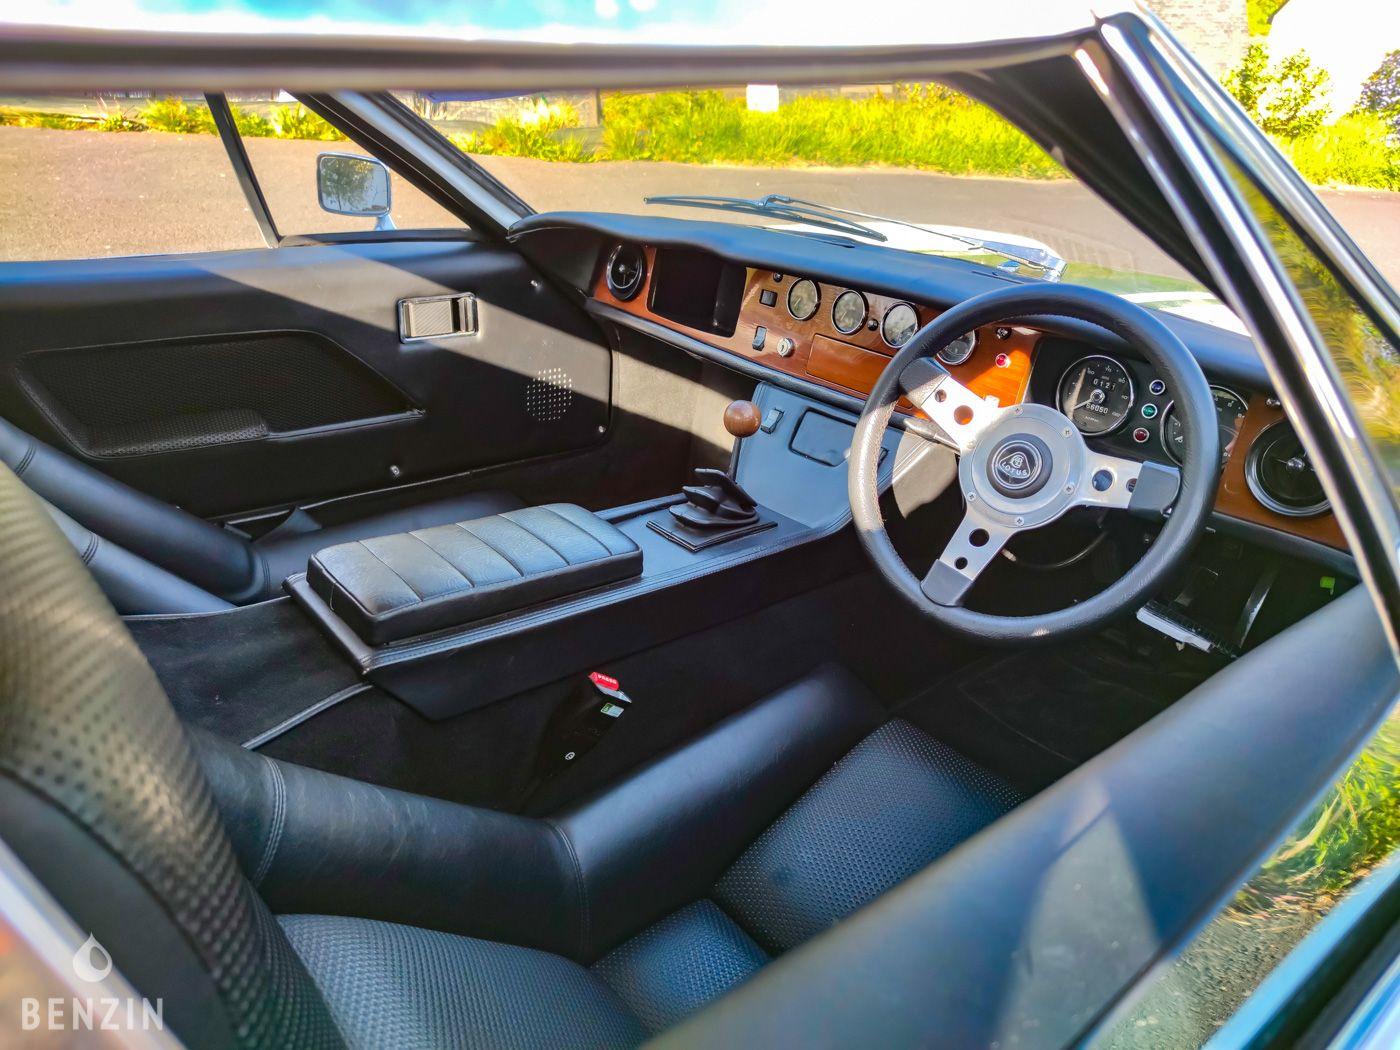 Lotus Europa S2 occasion à vendre for sale second hand te koop se vende zu verkaufen